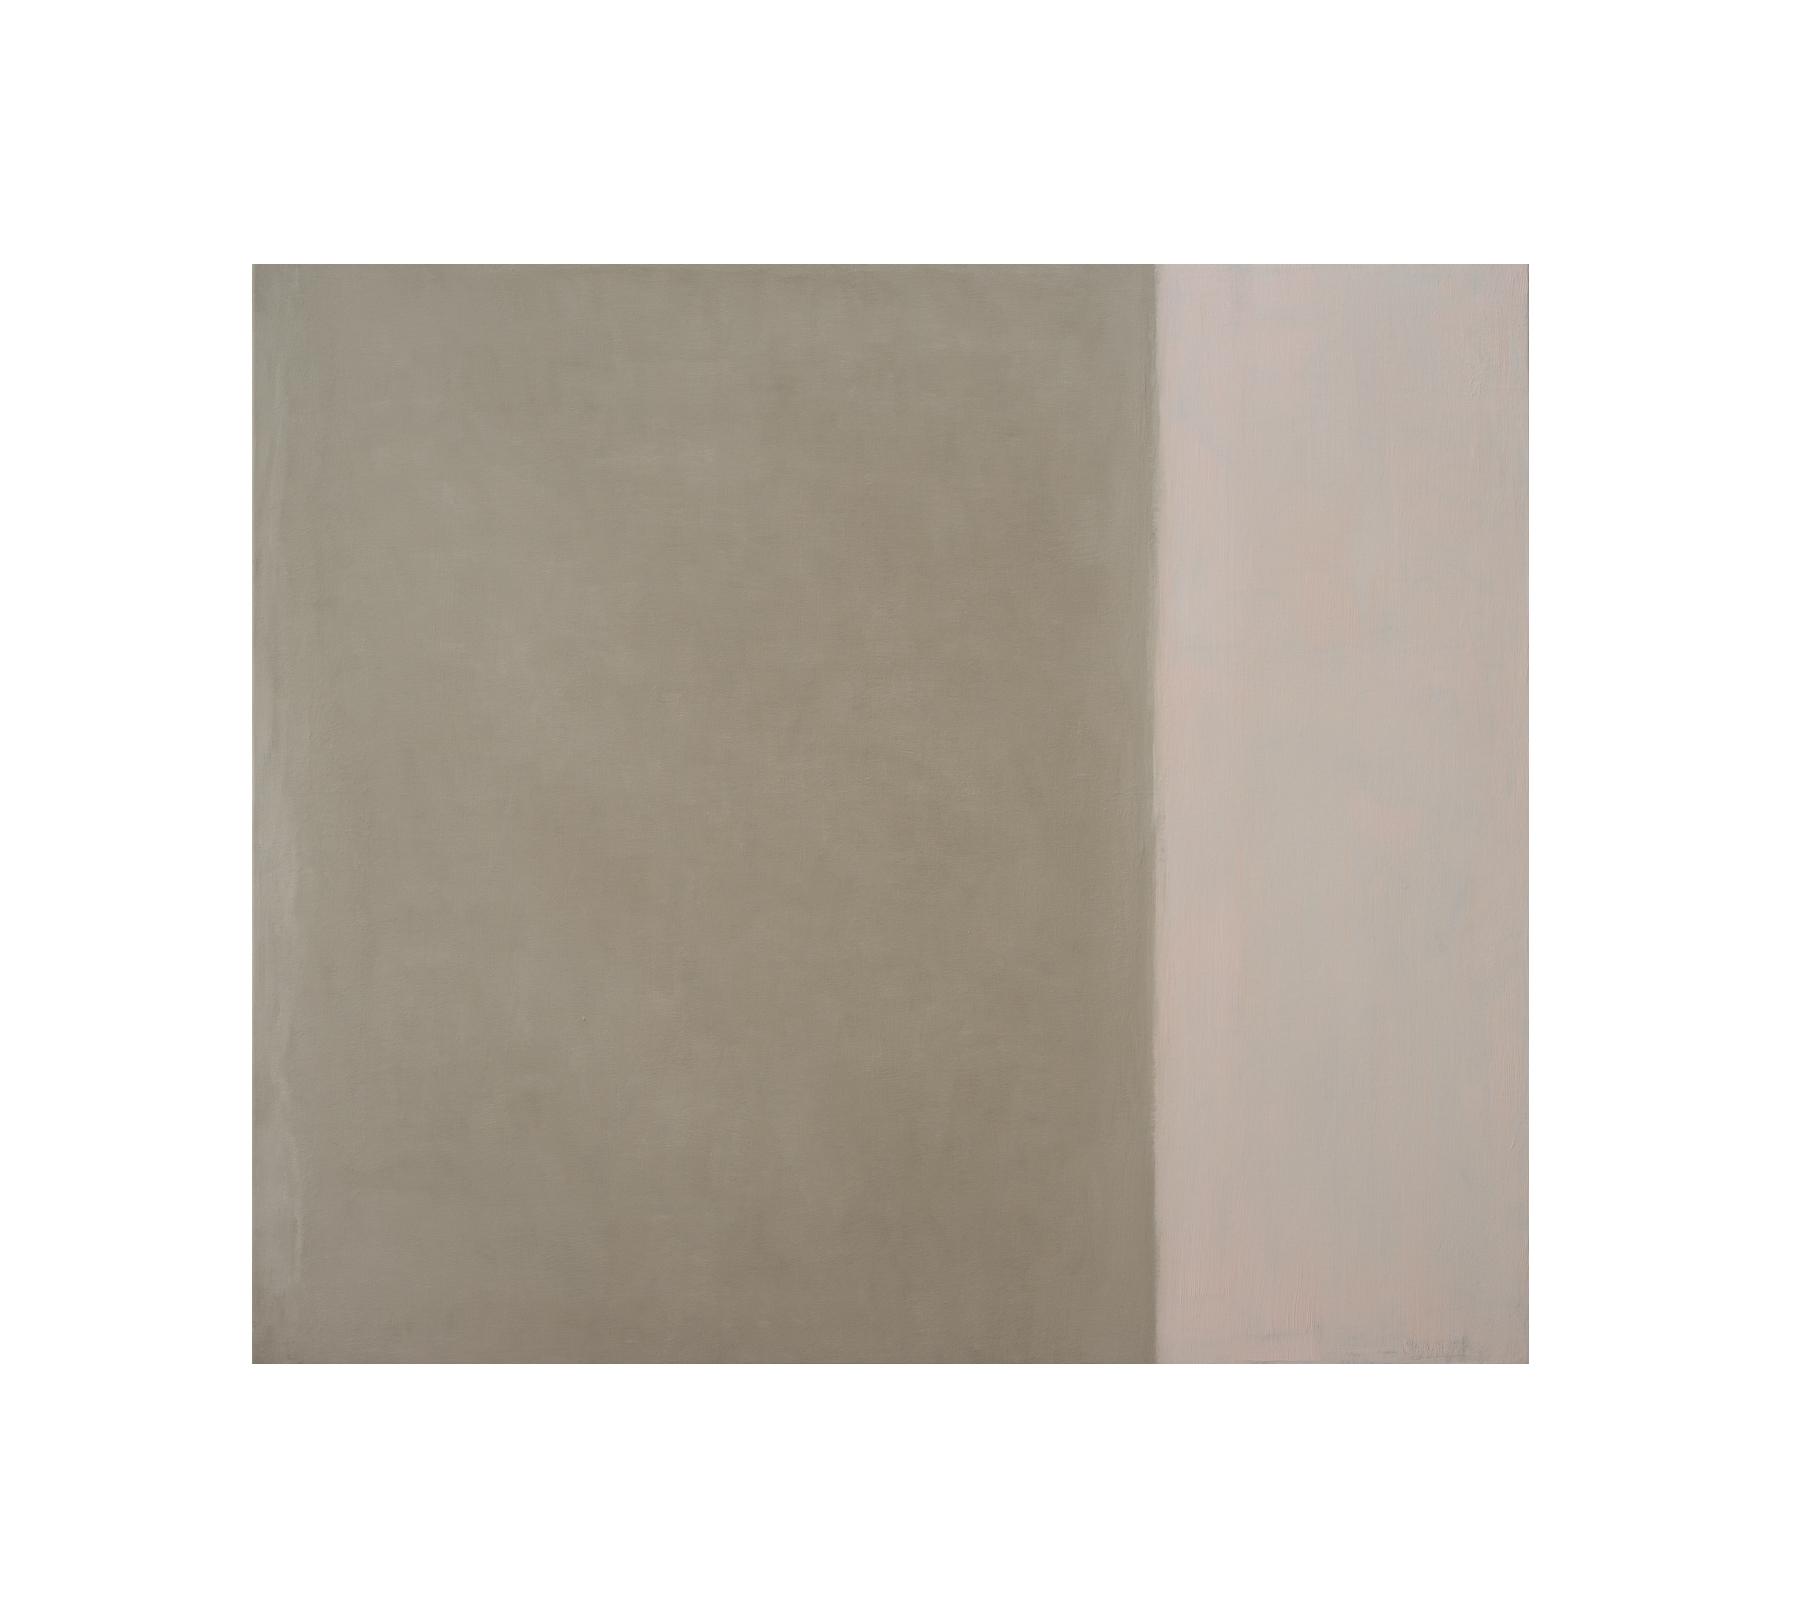 Untitled 2019 130x150cm